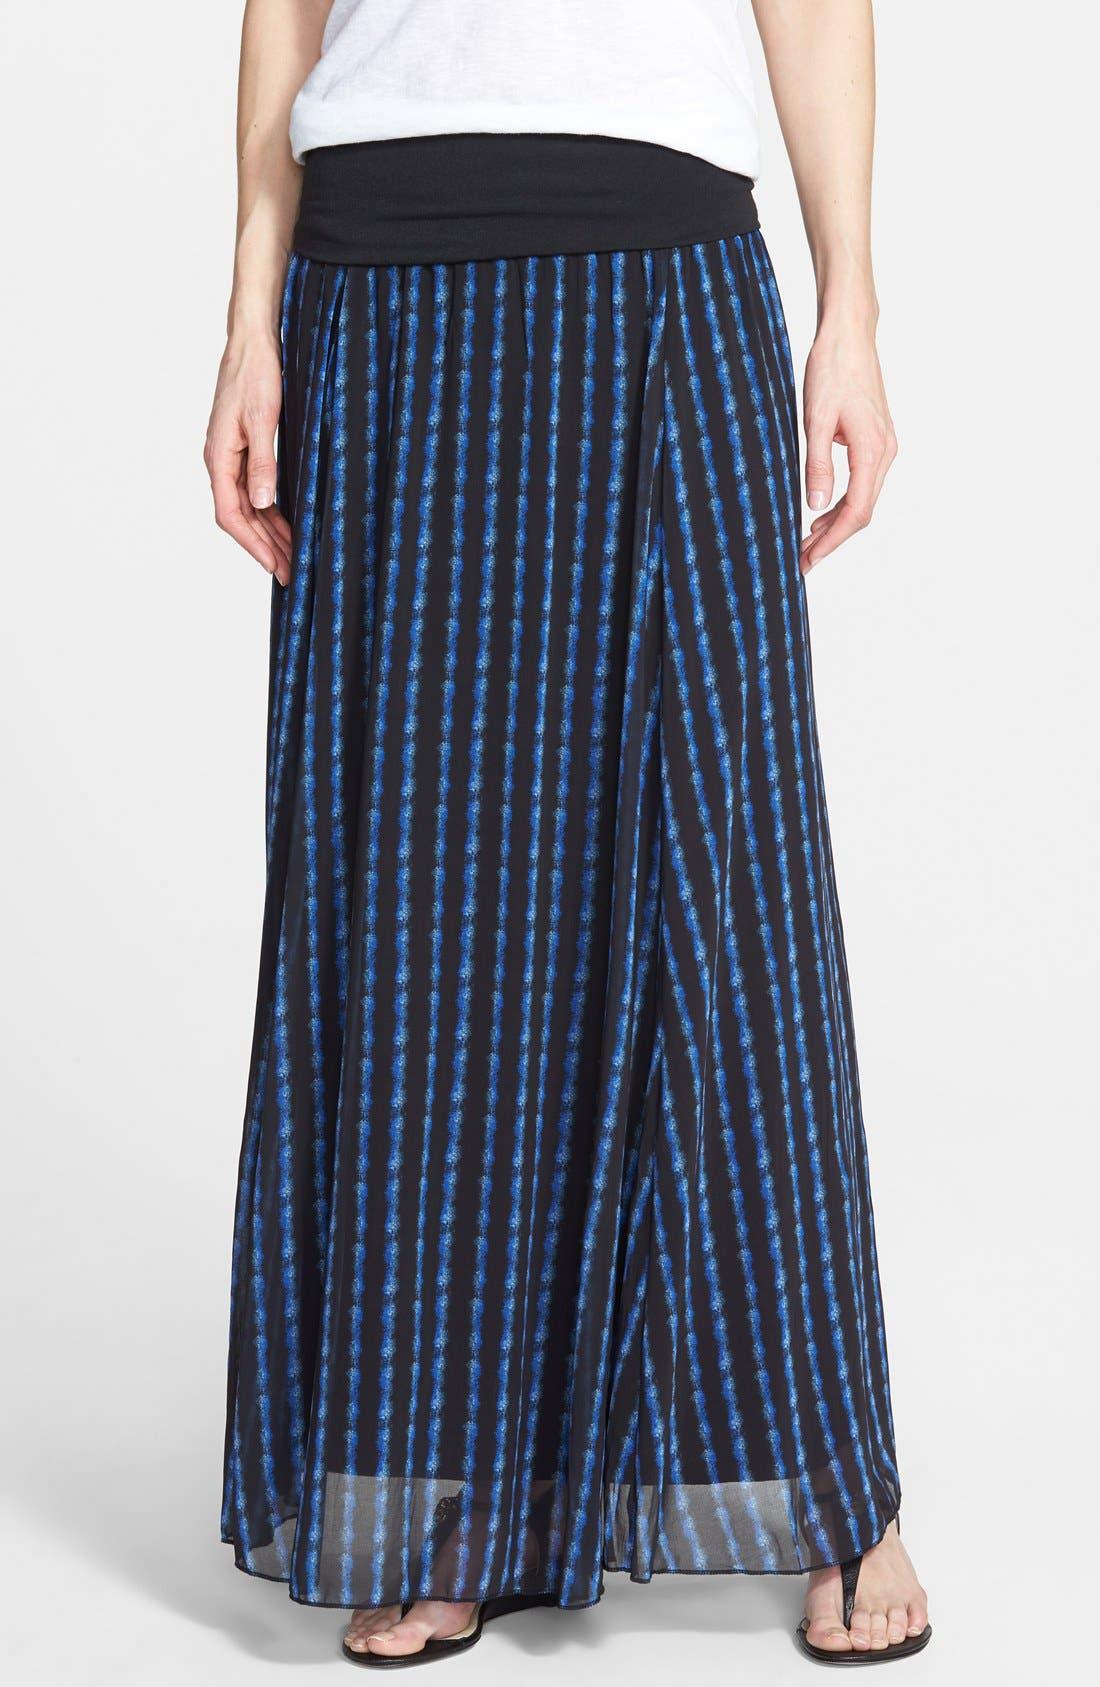 Alternate Image 1 Selected - Max & Mia Knit Waistband Print Maxi Skirt